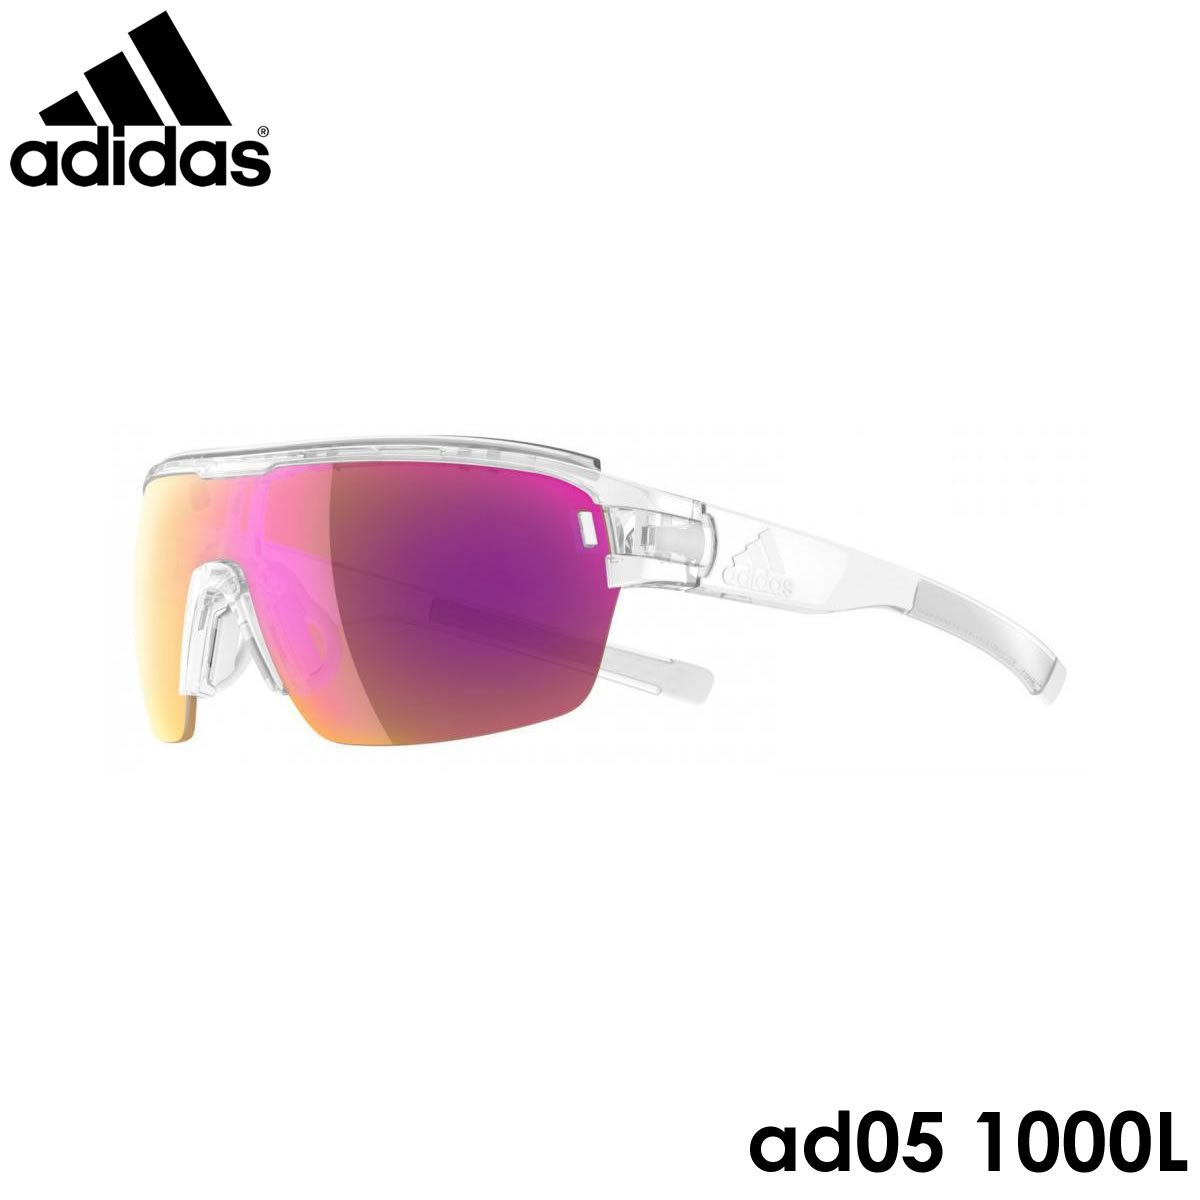 Blenders Eyewear L Series //// Kelvar Polarised Fashion Sunglasses small fit